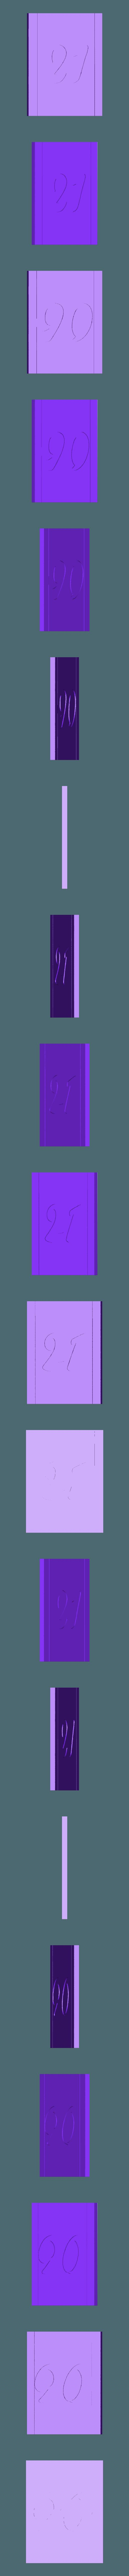 21_-_6.stl Download free SCAD file Perpetual Flip Calendar (W/ Customizable Font) • 3D printable model, Dsk